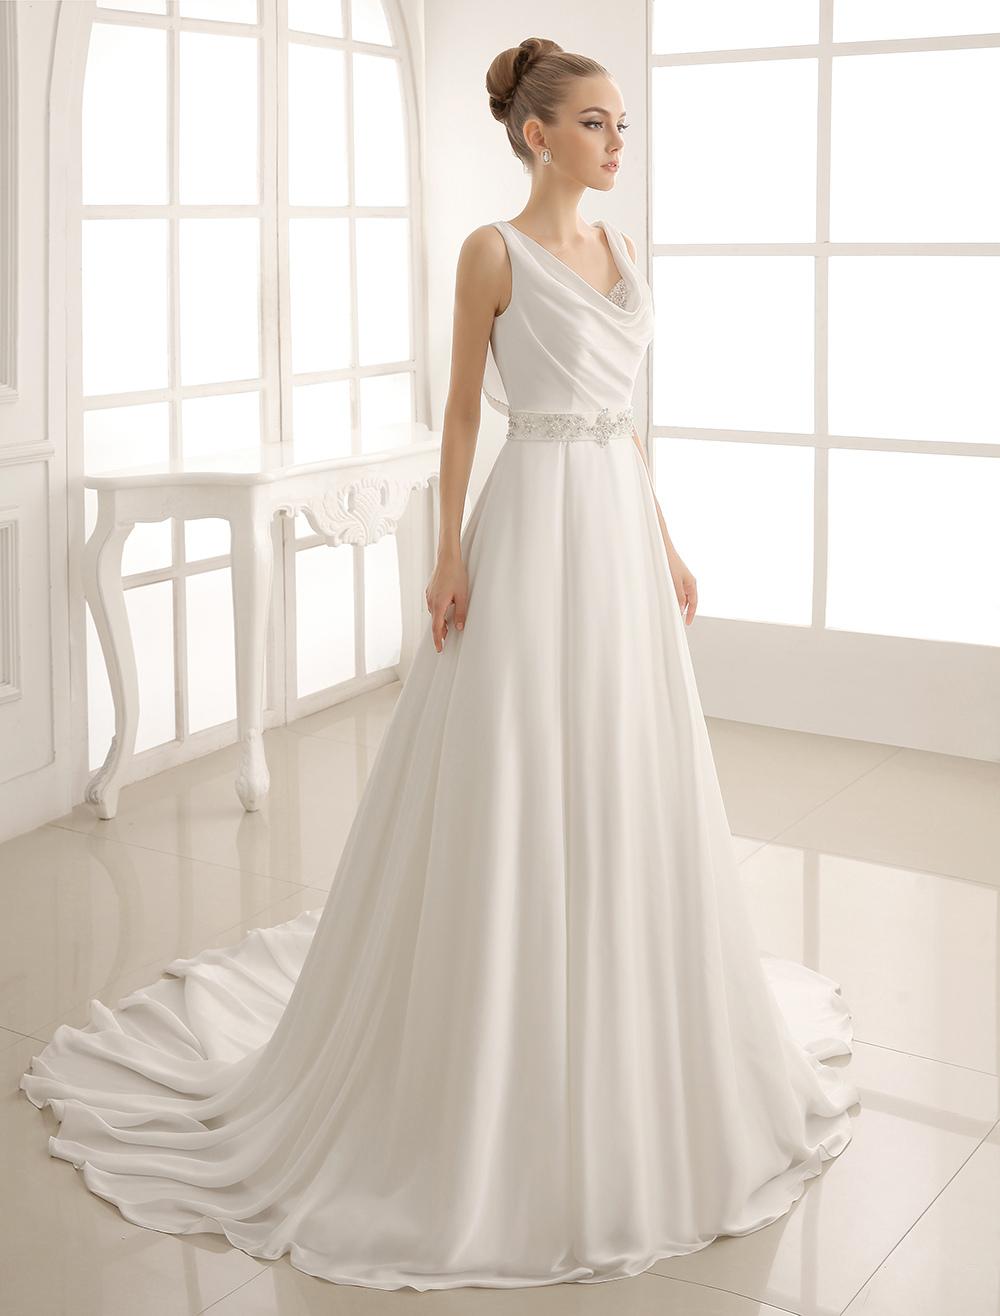 Turndown Collar Brides Wedding Dress With Pleated Satin Milanoo